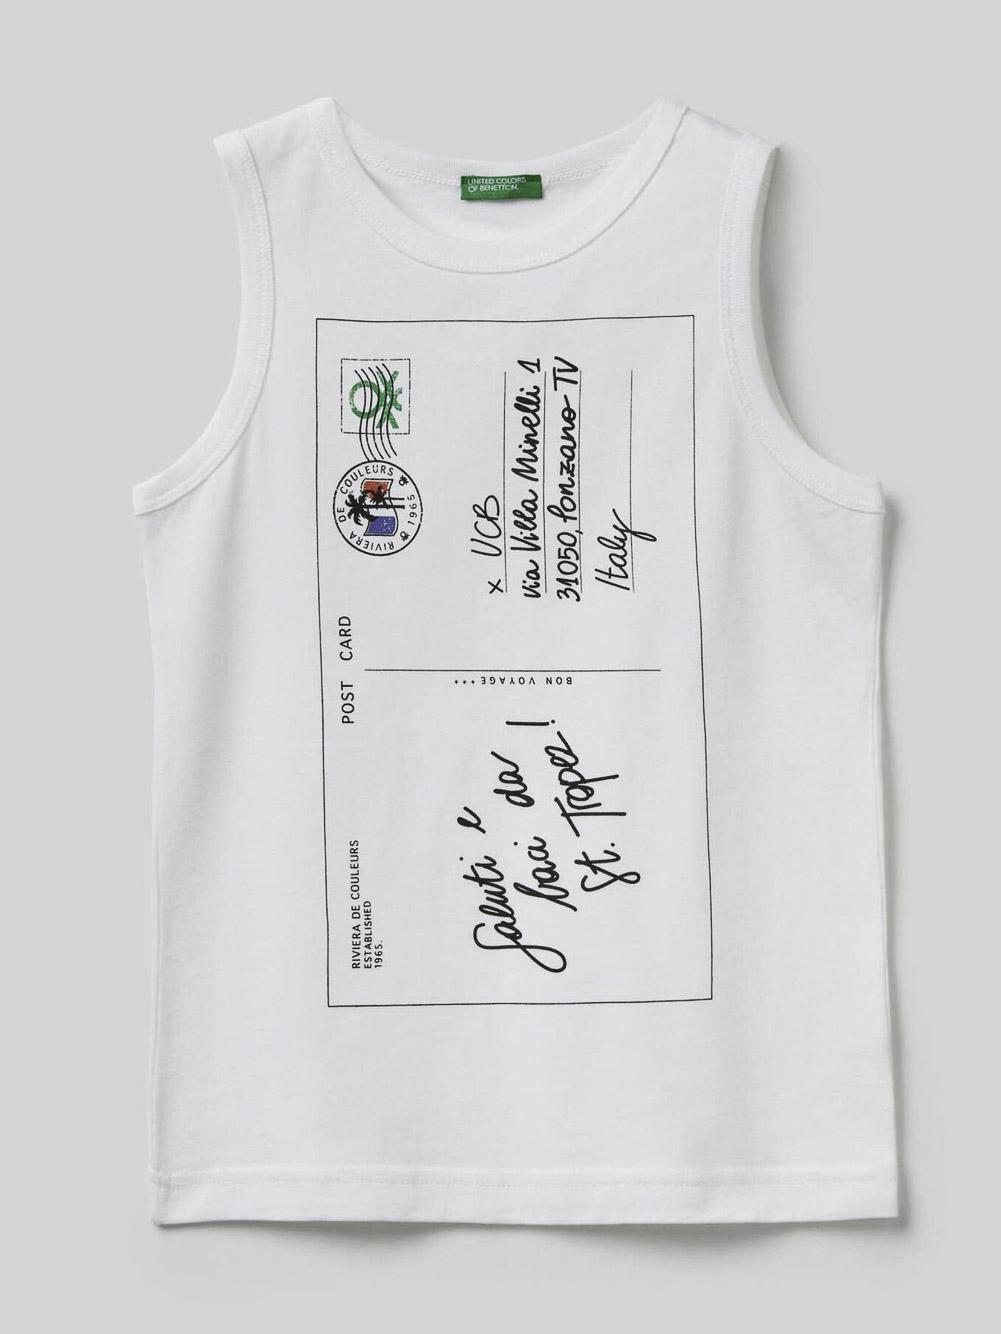 012 BENETTON Μπλούζα t-shirt 3096C8251 20P101